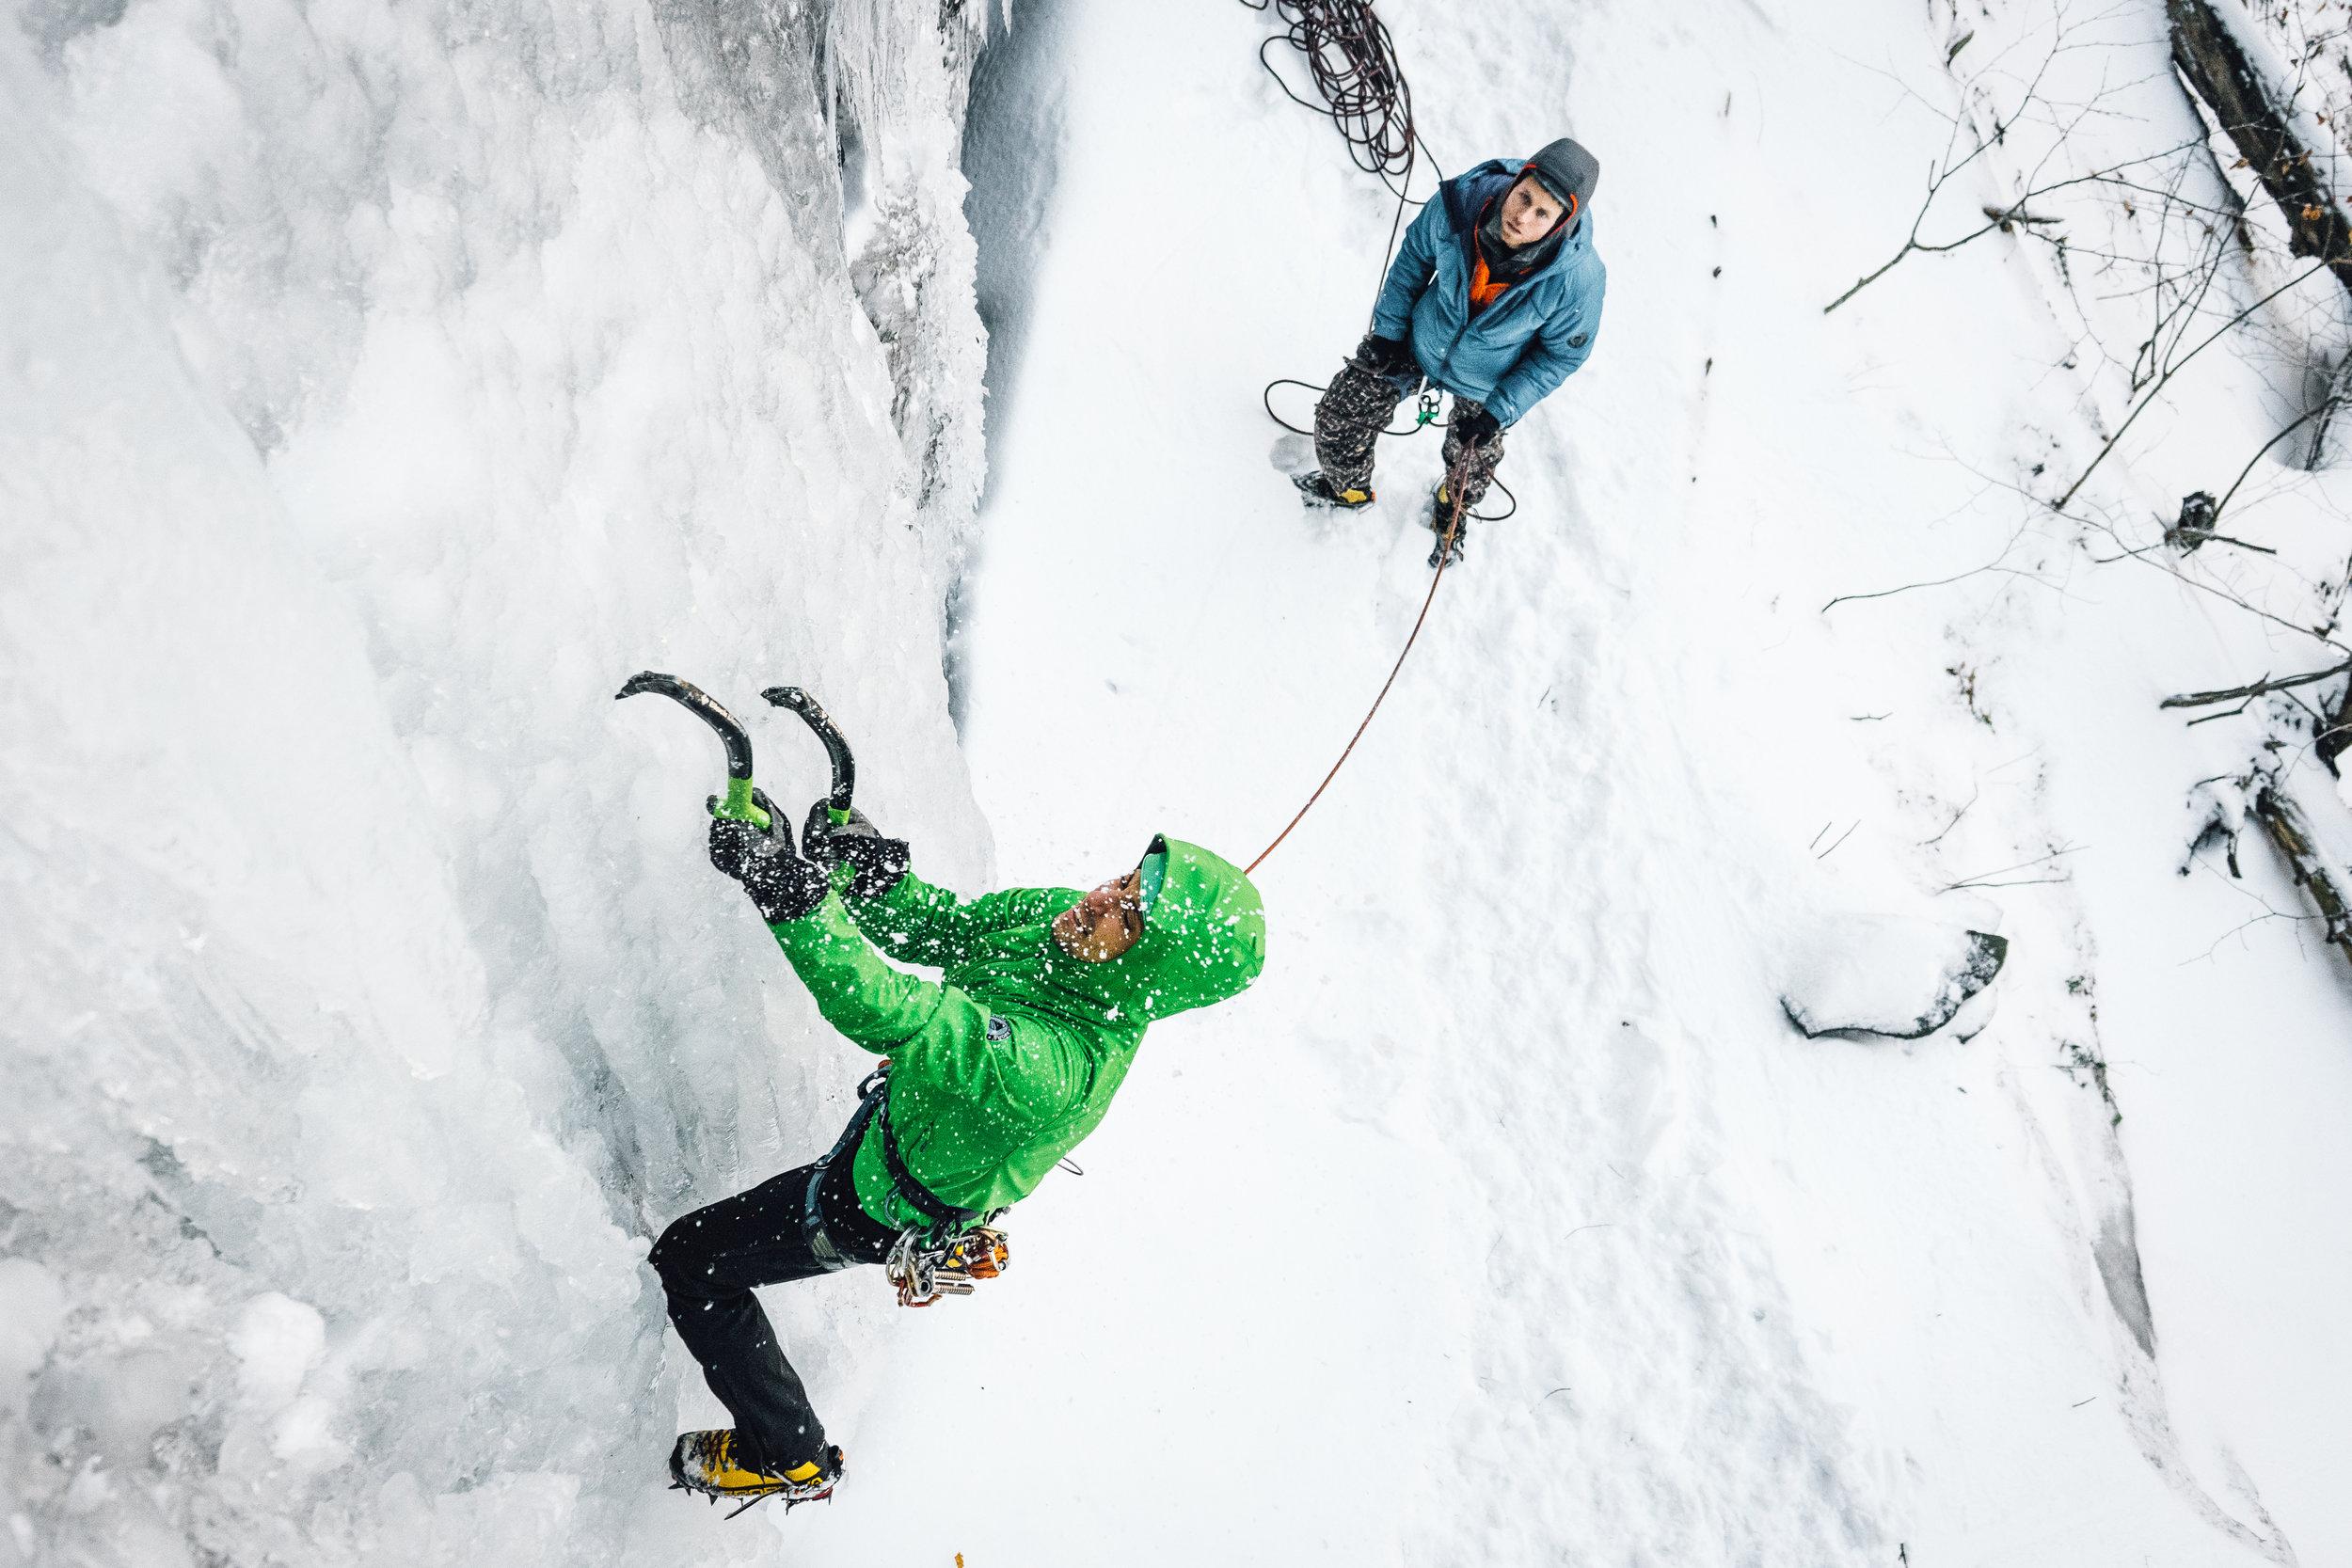 iceclimbing_catskills_feb142019_0135.jpg